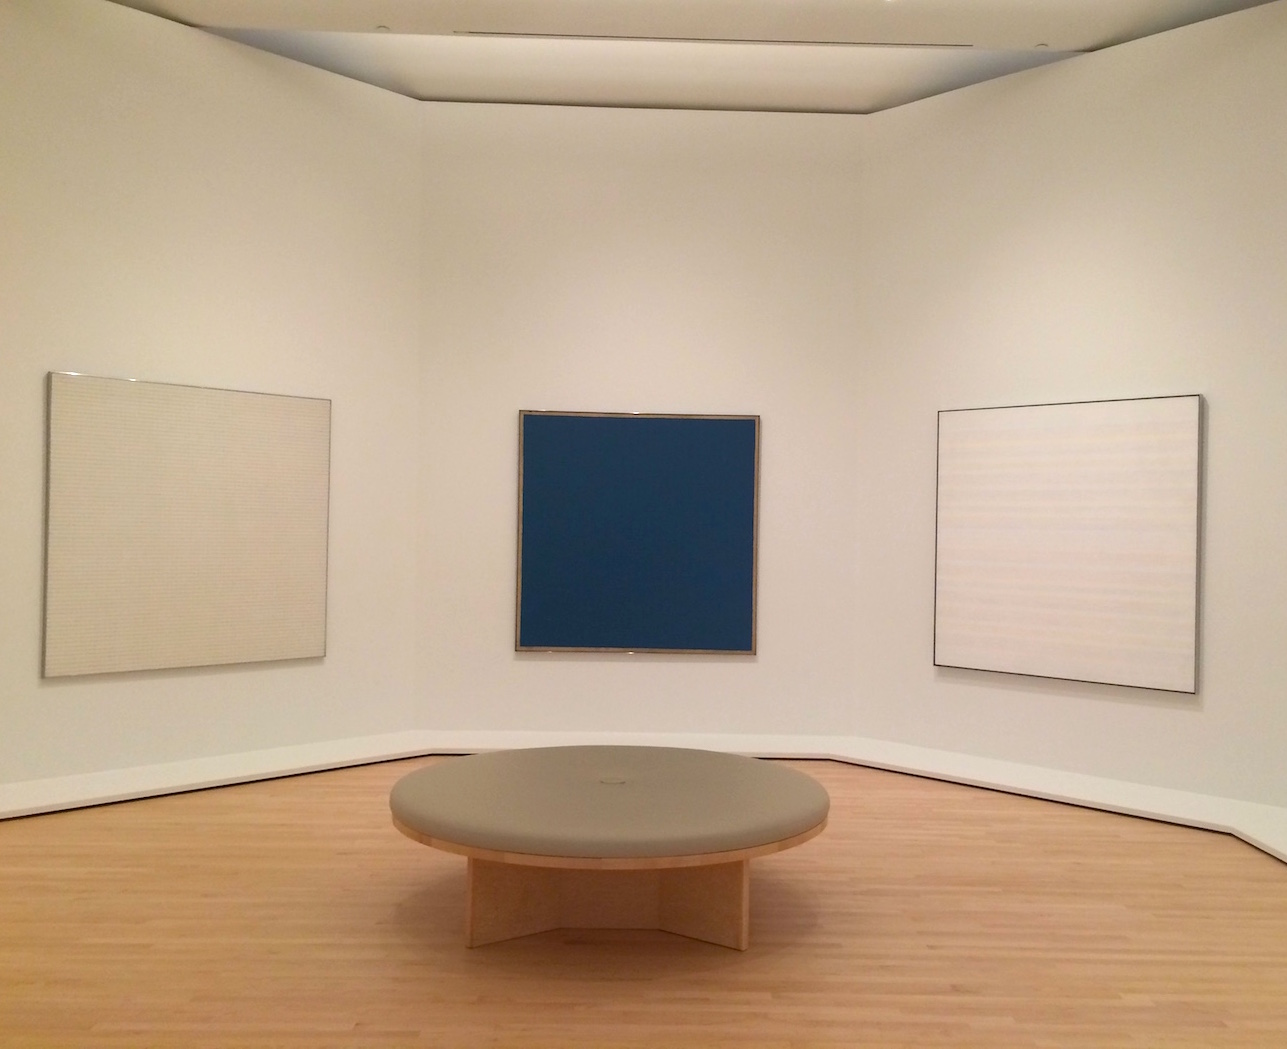 Agnes Martin's gallery